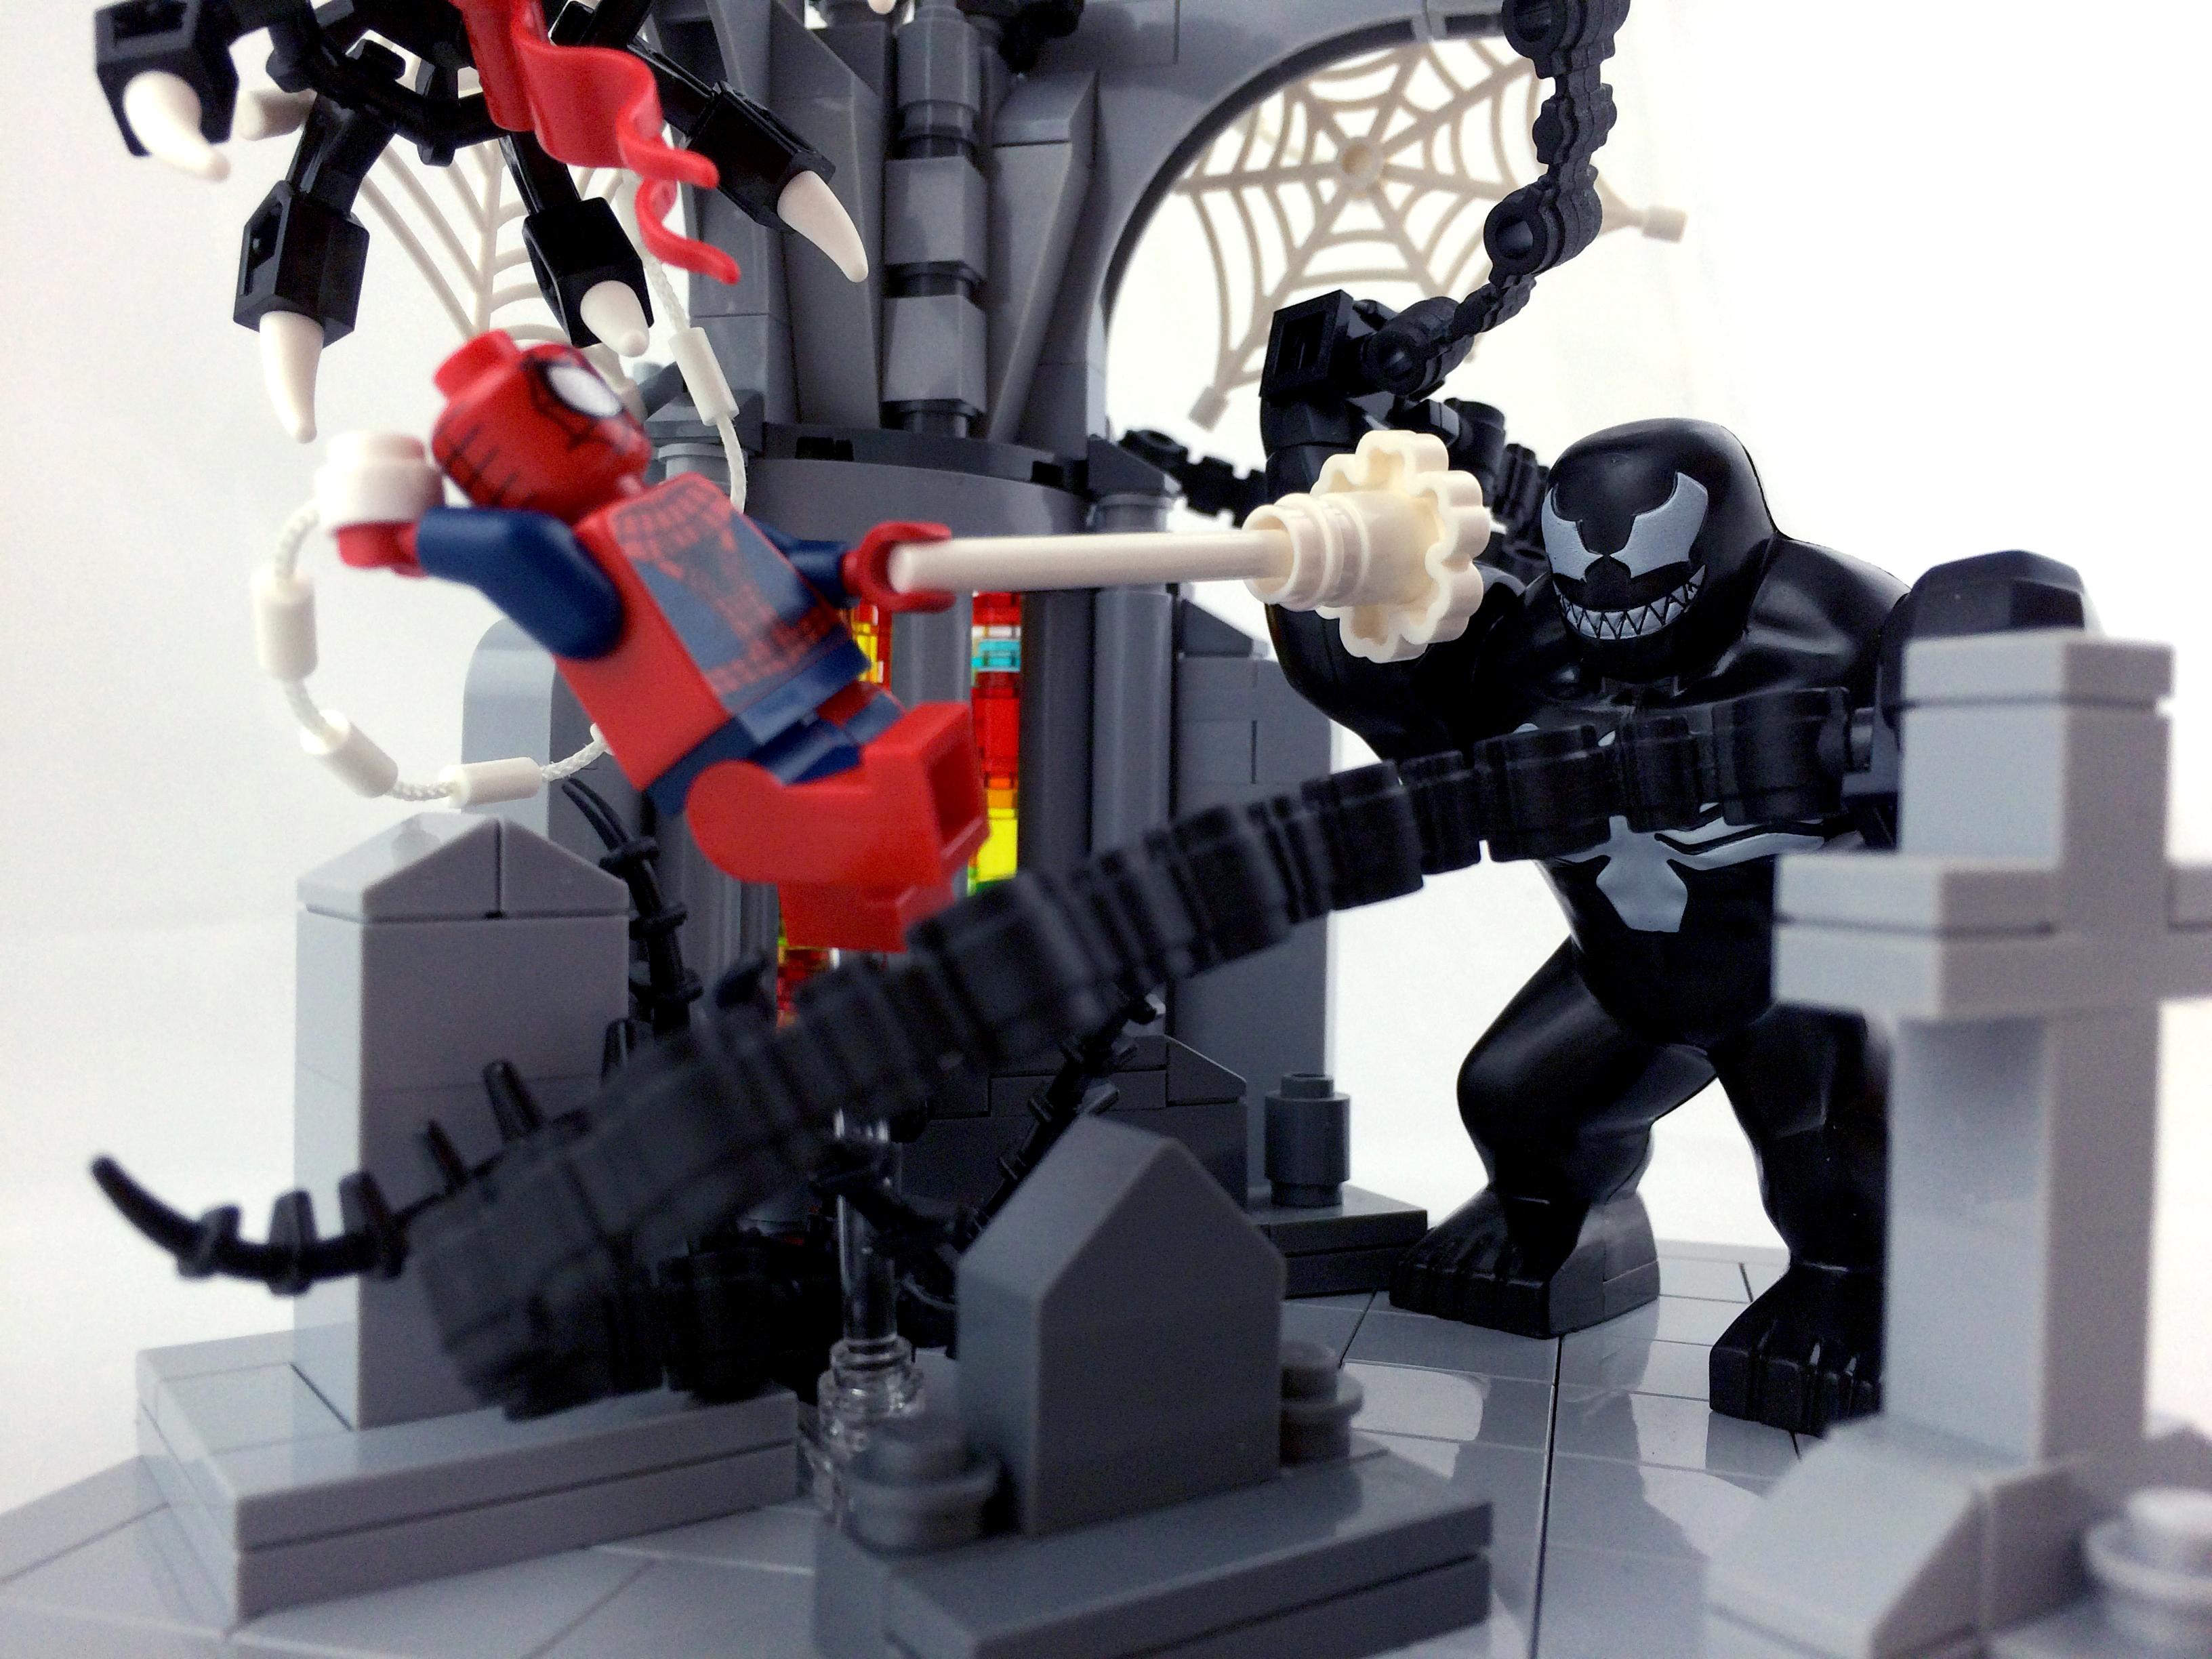 Wallpaper Black Robot Red Lego Technology Grave Cemetery